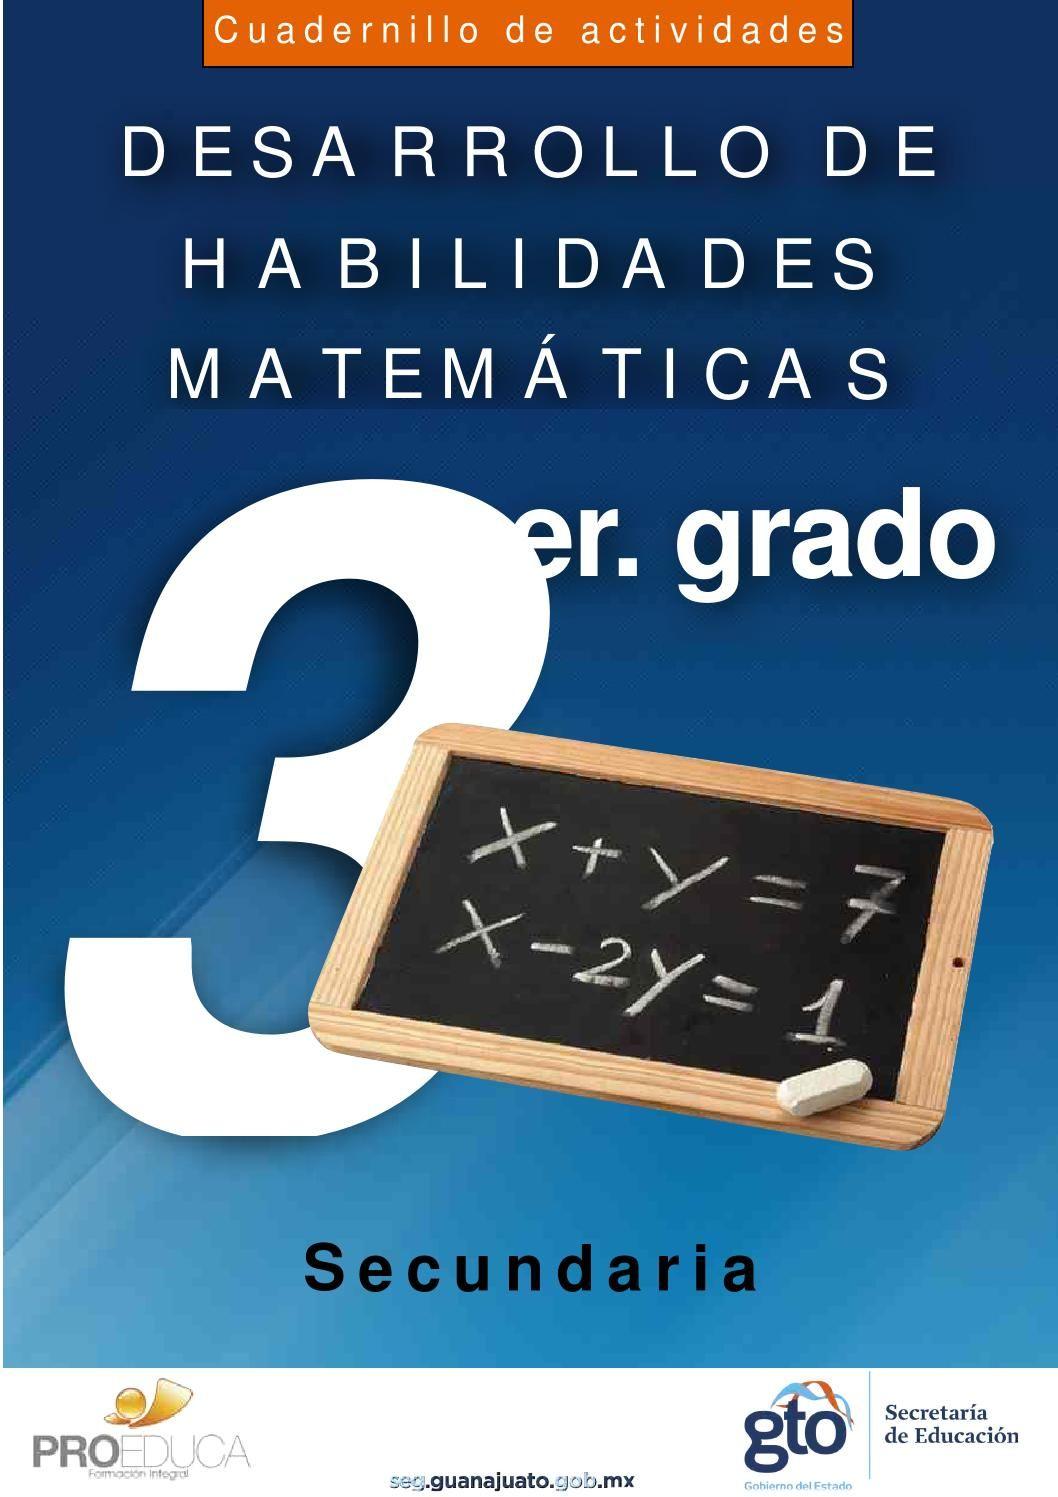 Cuadernillo Mat 3 Sec Web Habilidades Matemáticas Matemáticas De Escuela Secundaria Juegos Matematicos Secundaria